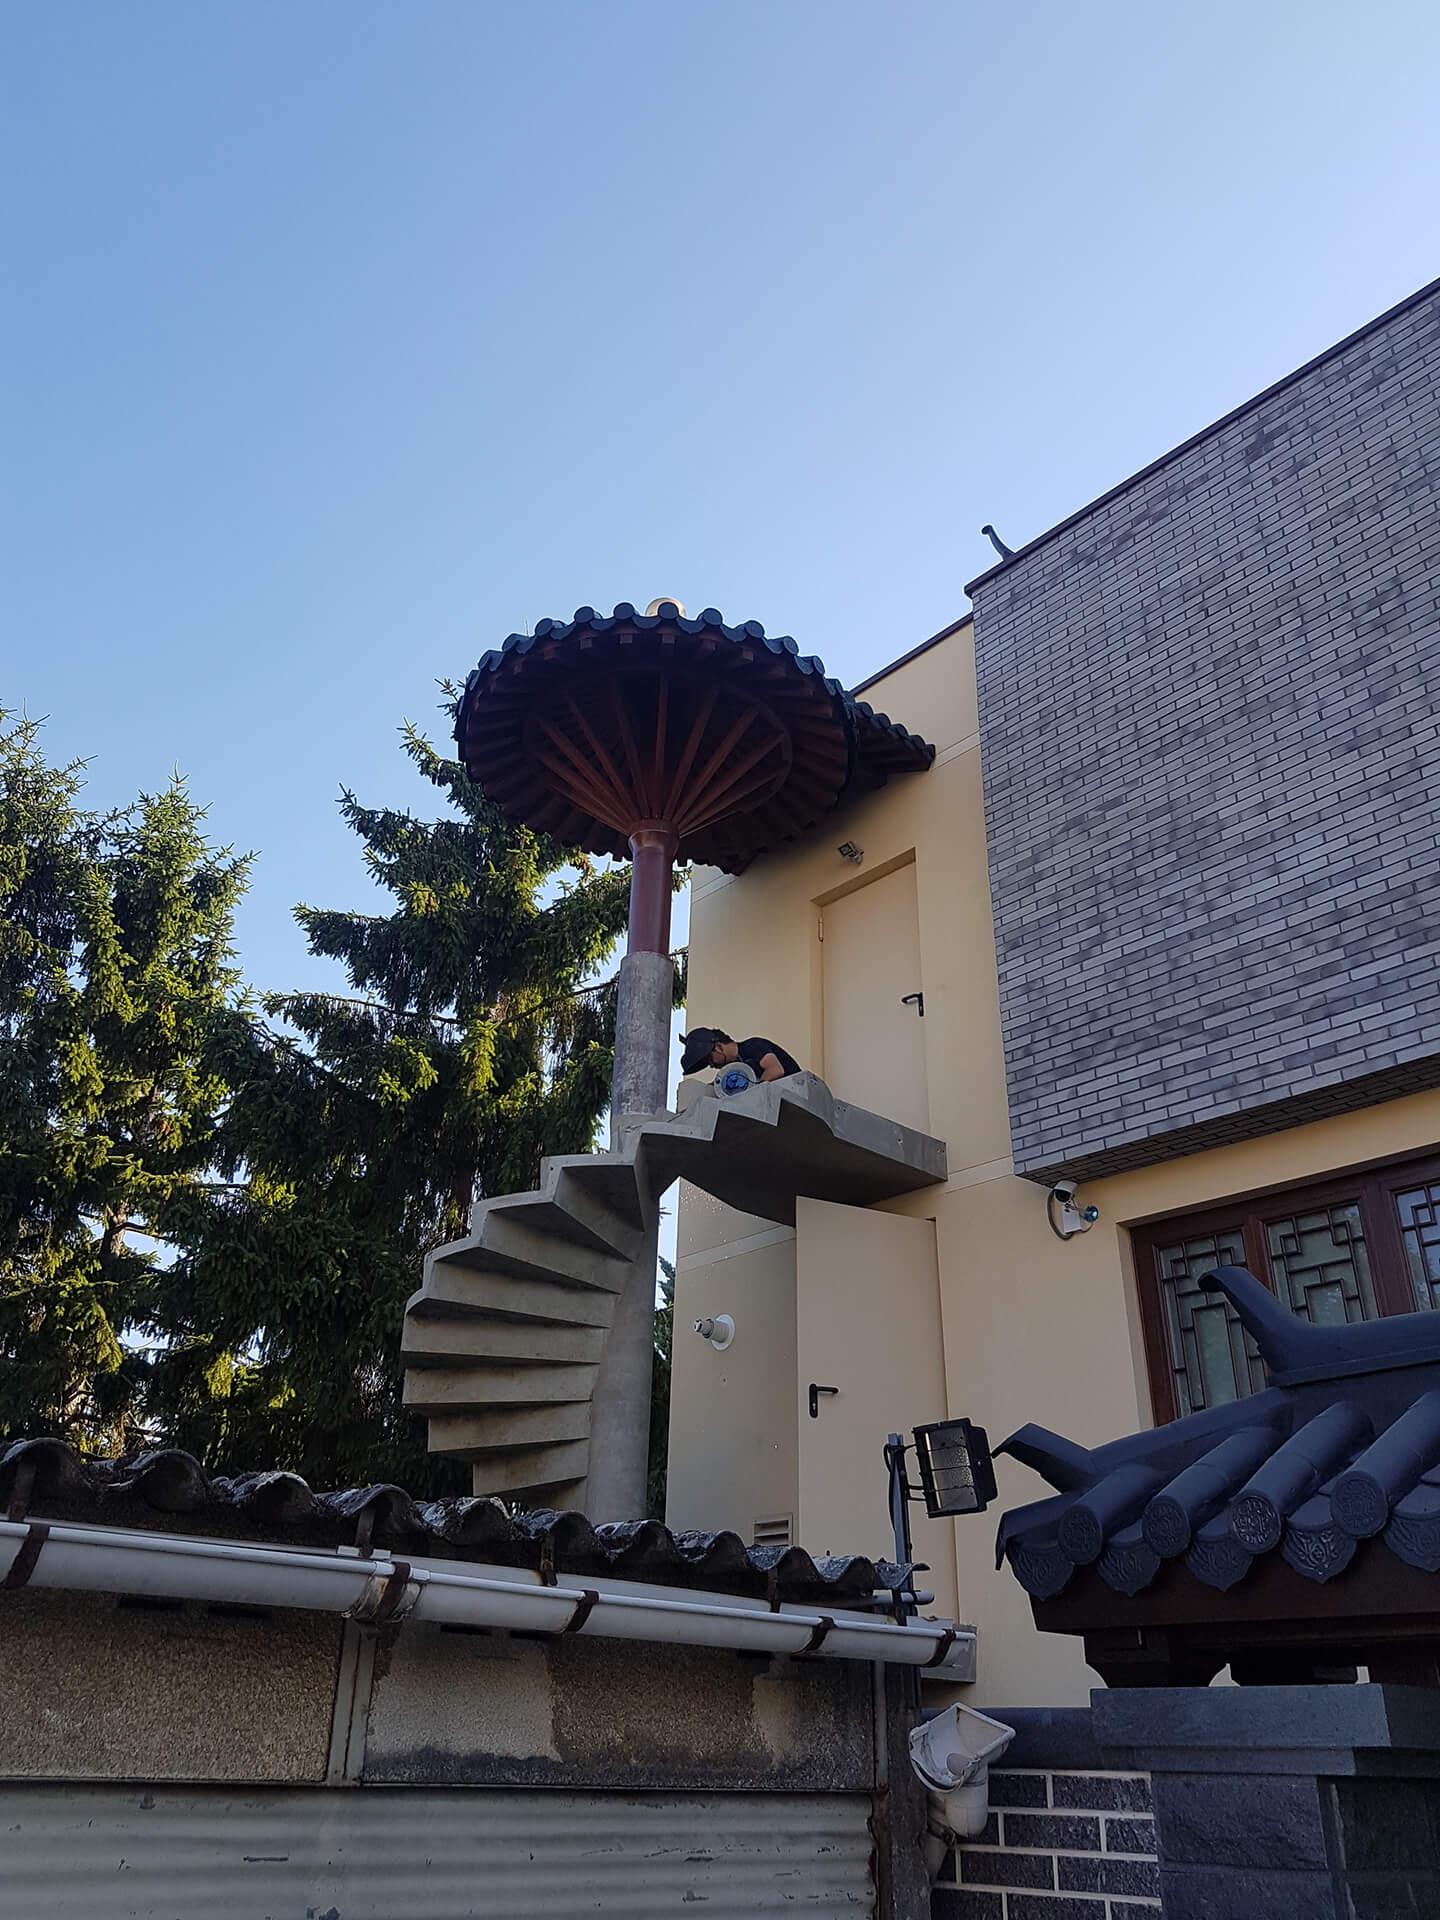 lopes e caldas pagode